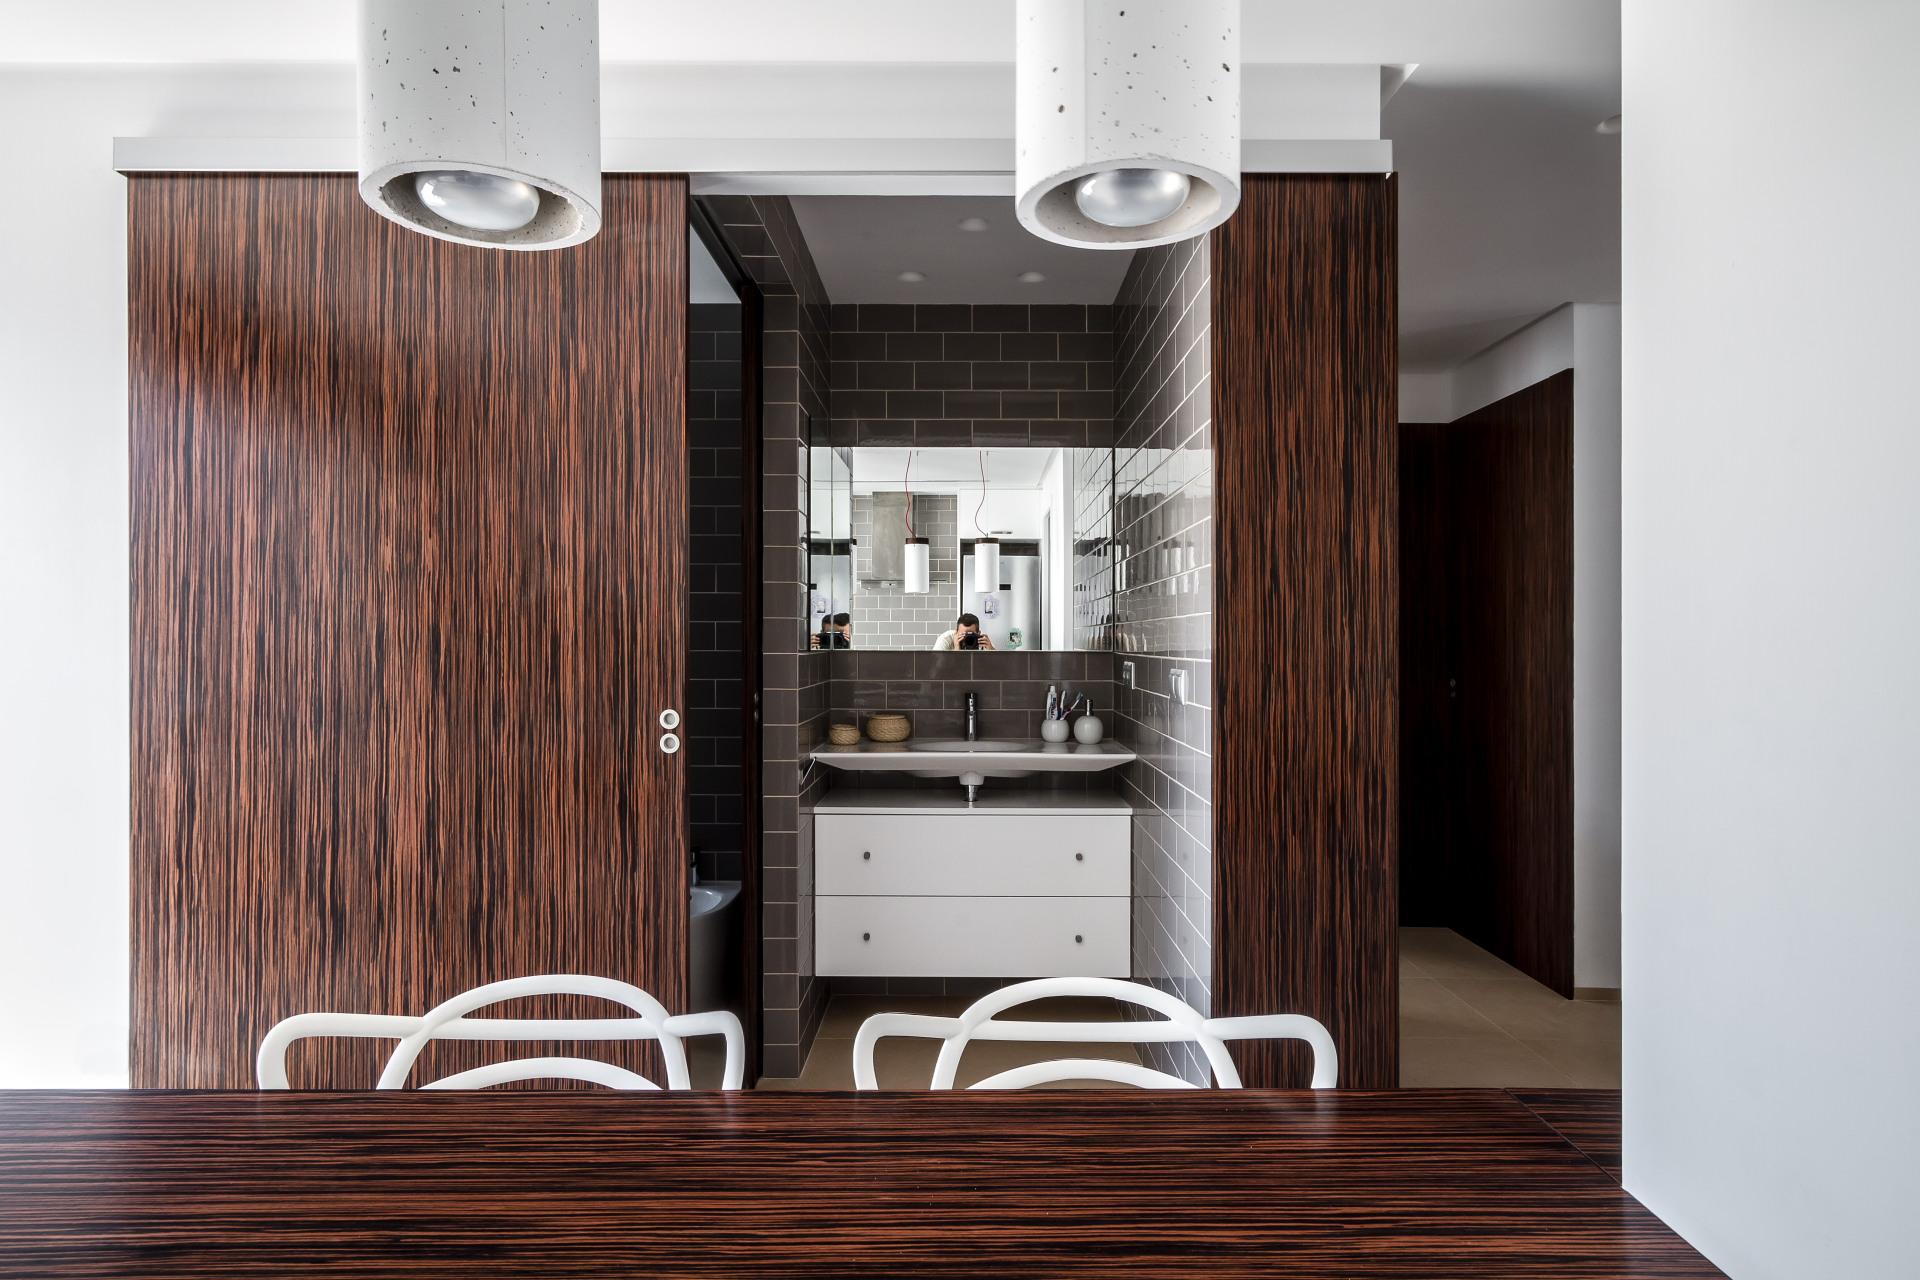 fotografia-arquitectura-valencia-german-cabo-selecta-home-denia (9)